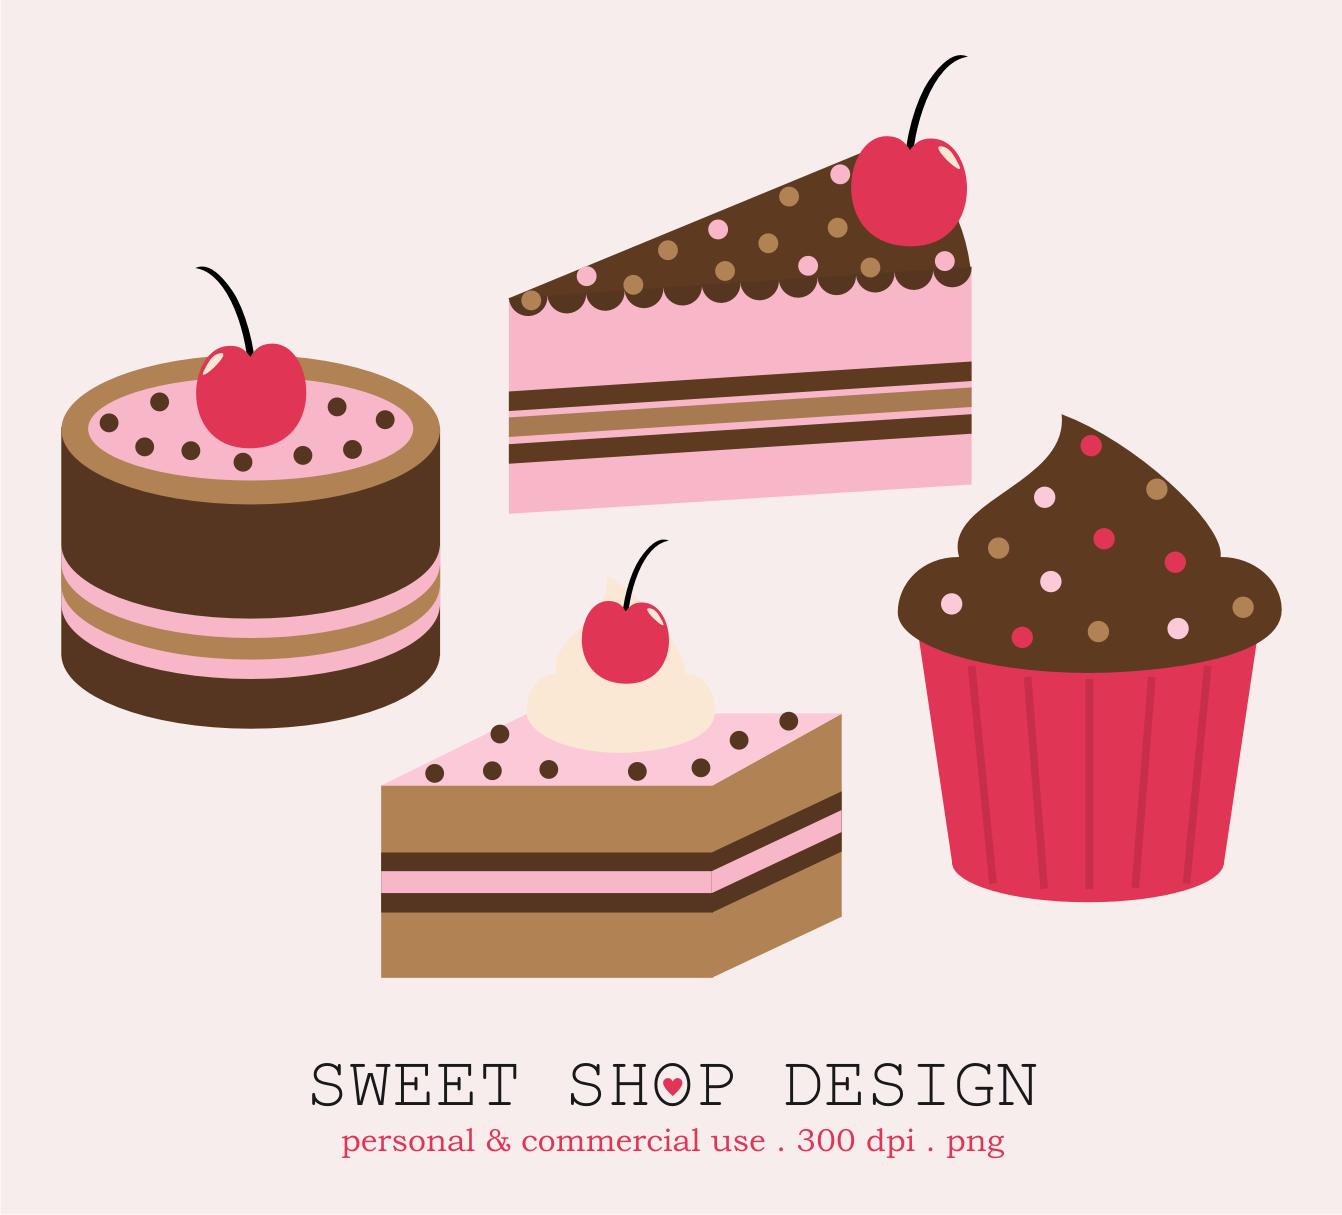 Sweet Shop Design Cakes Clip Art Freebies